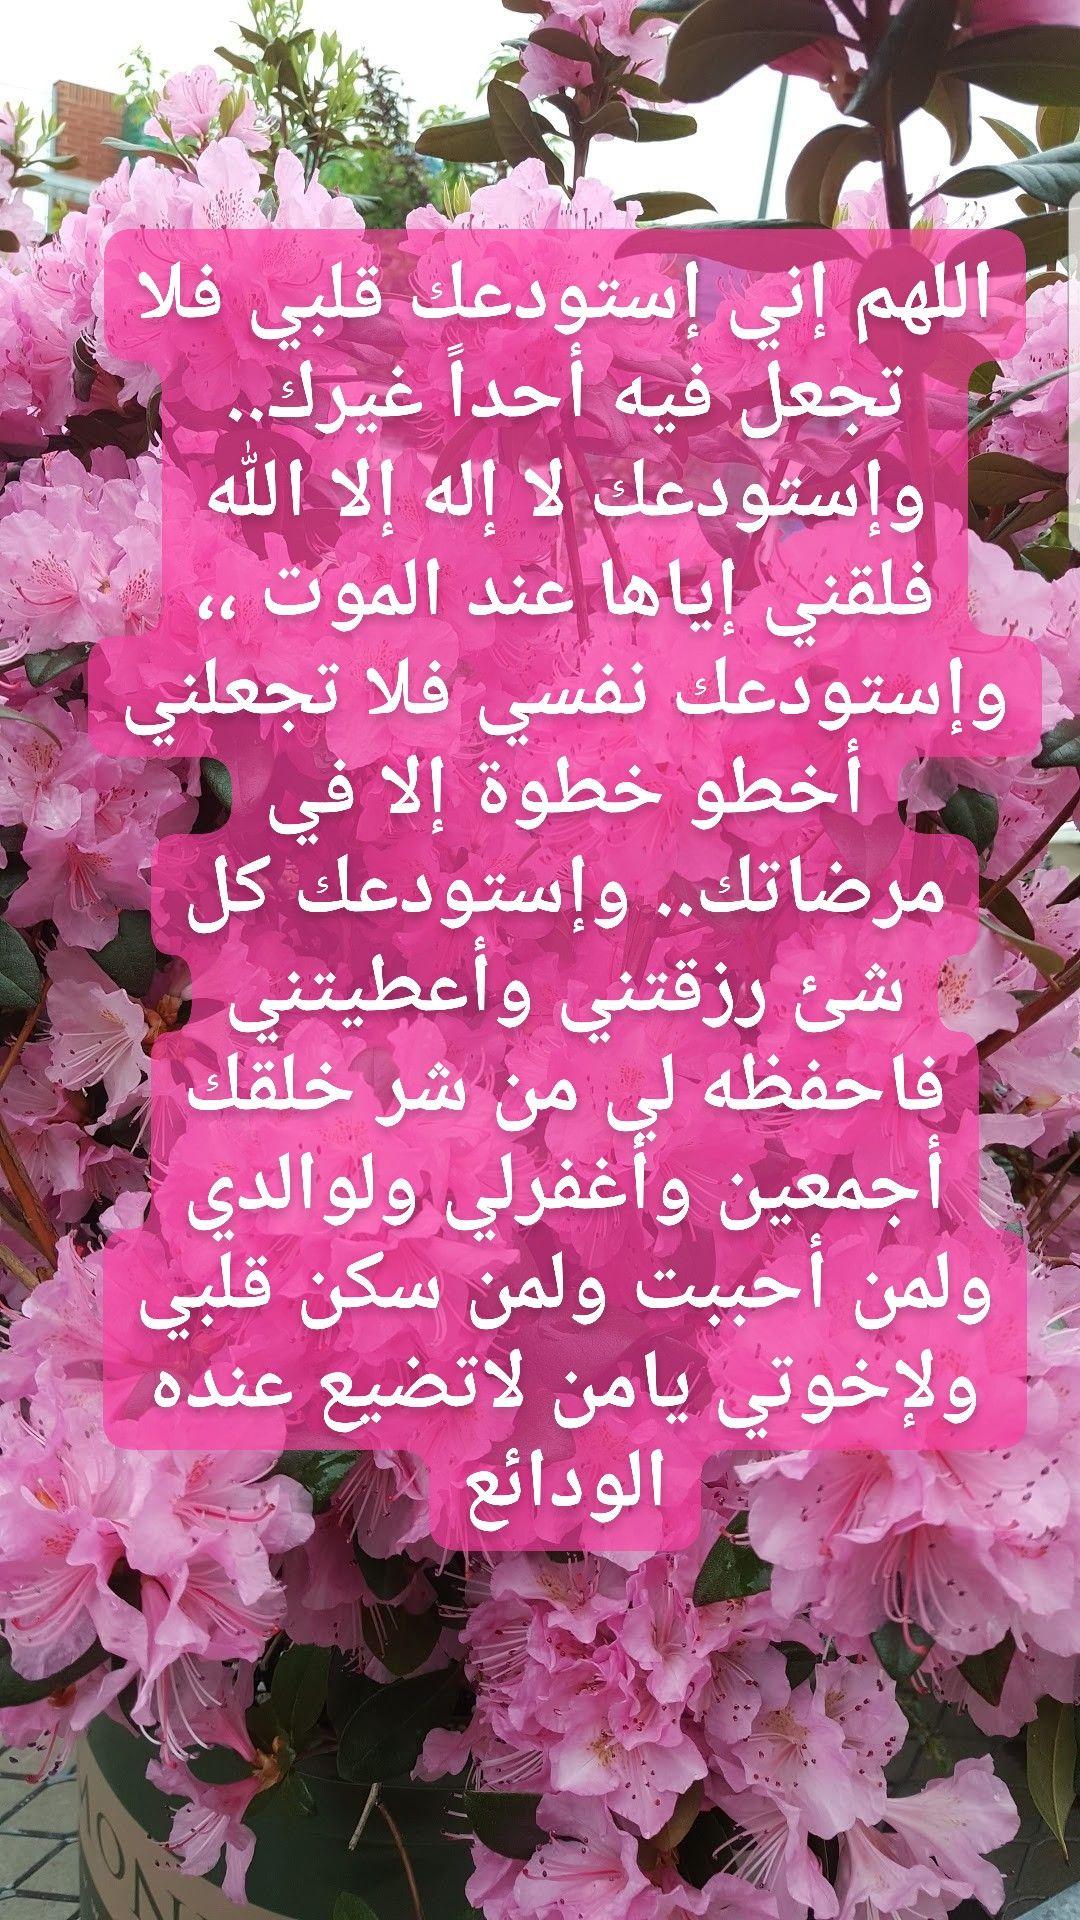 Pin By The Noble Quran On I Love Allah Quran Islam The Prophet Miracles Hadith Heaven Prophets Faith Prayer Dua حكم وعبر احاديث الله اسلام قرآن دعاء Arabic Quotes Allah Islam